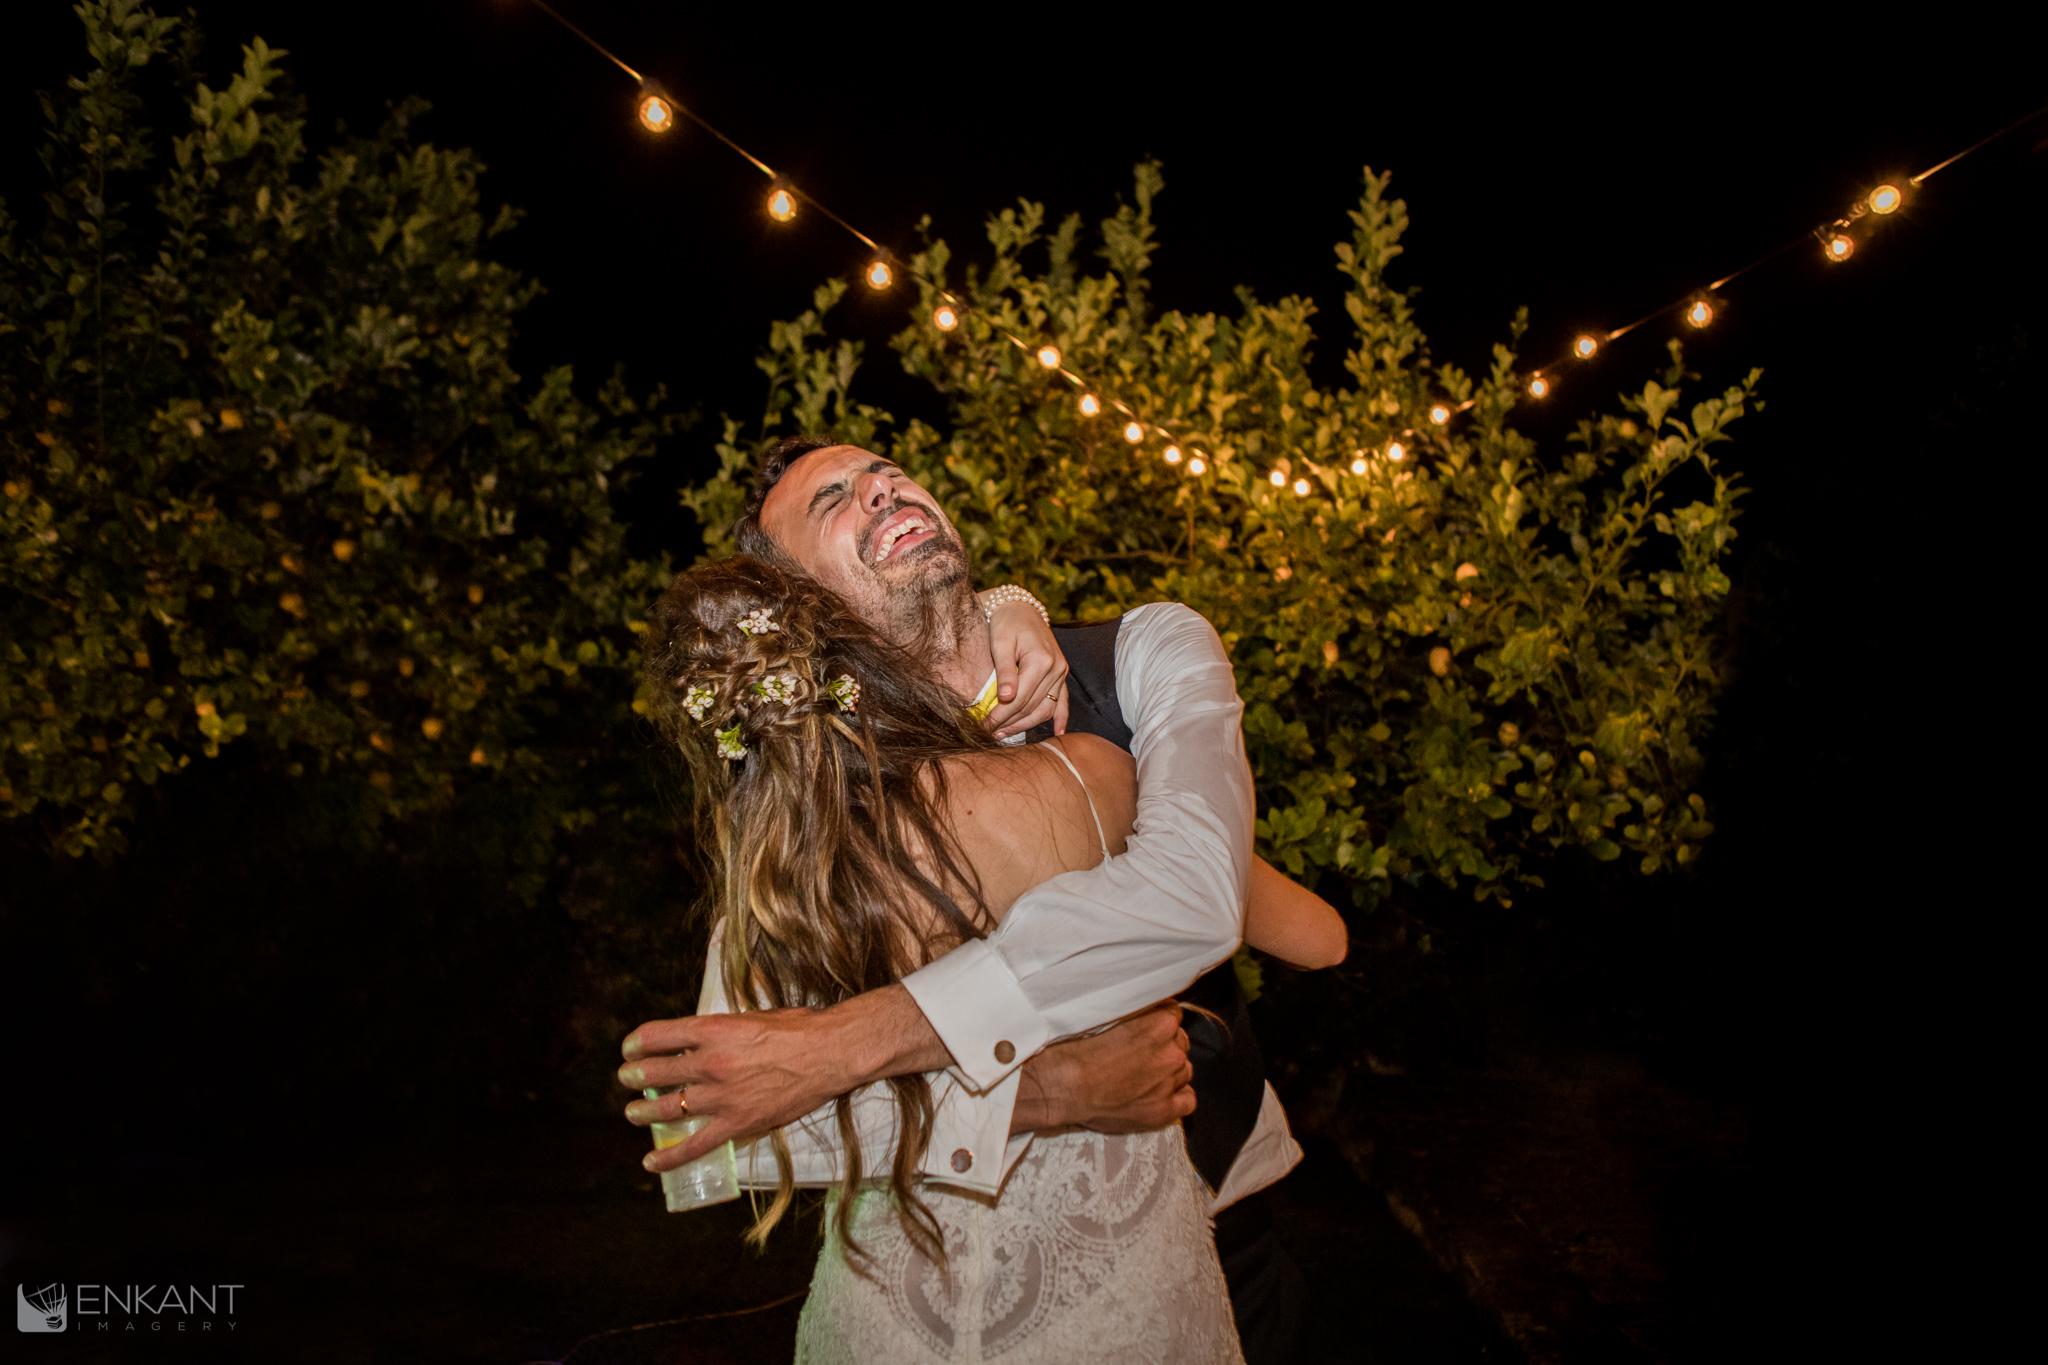 Fotografo matrimonio Sicilia - enkant Imagery-63.jpg